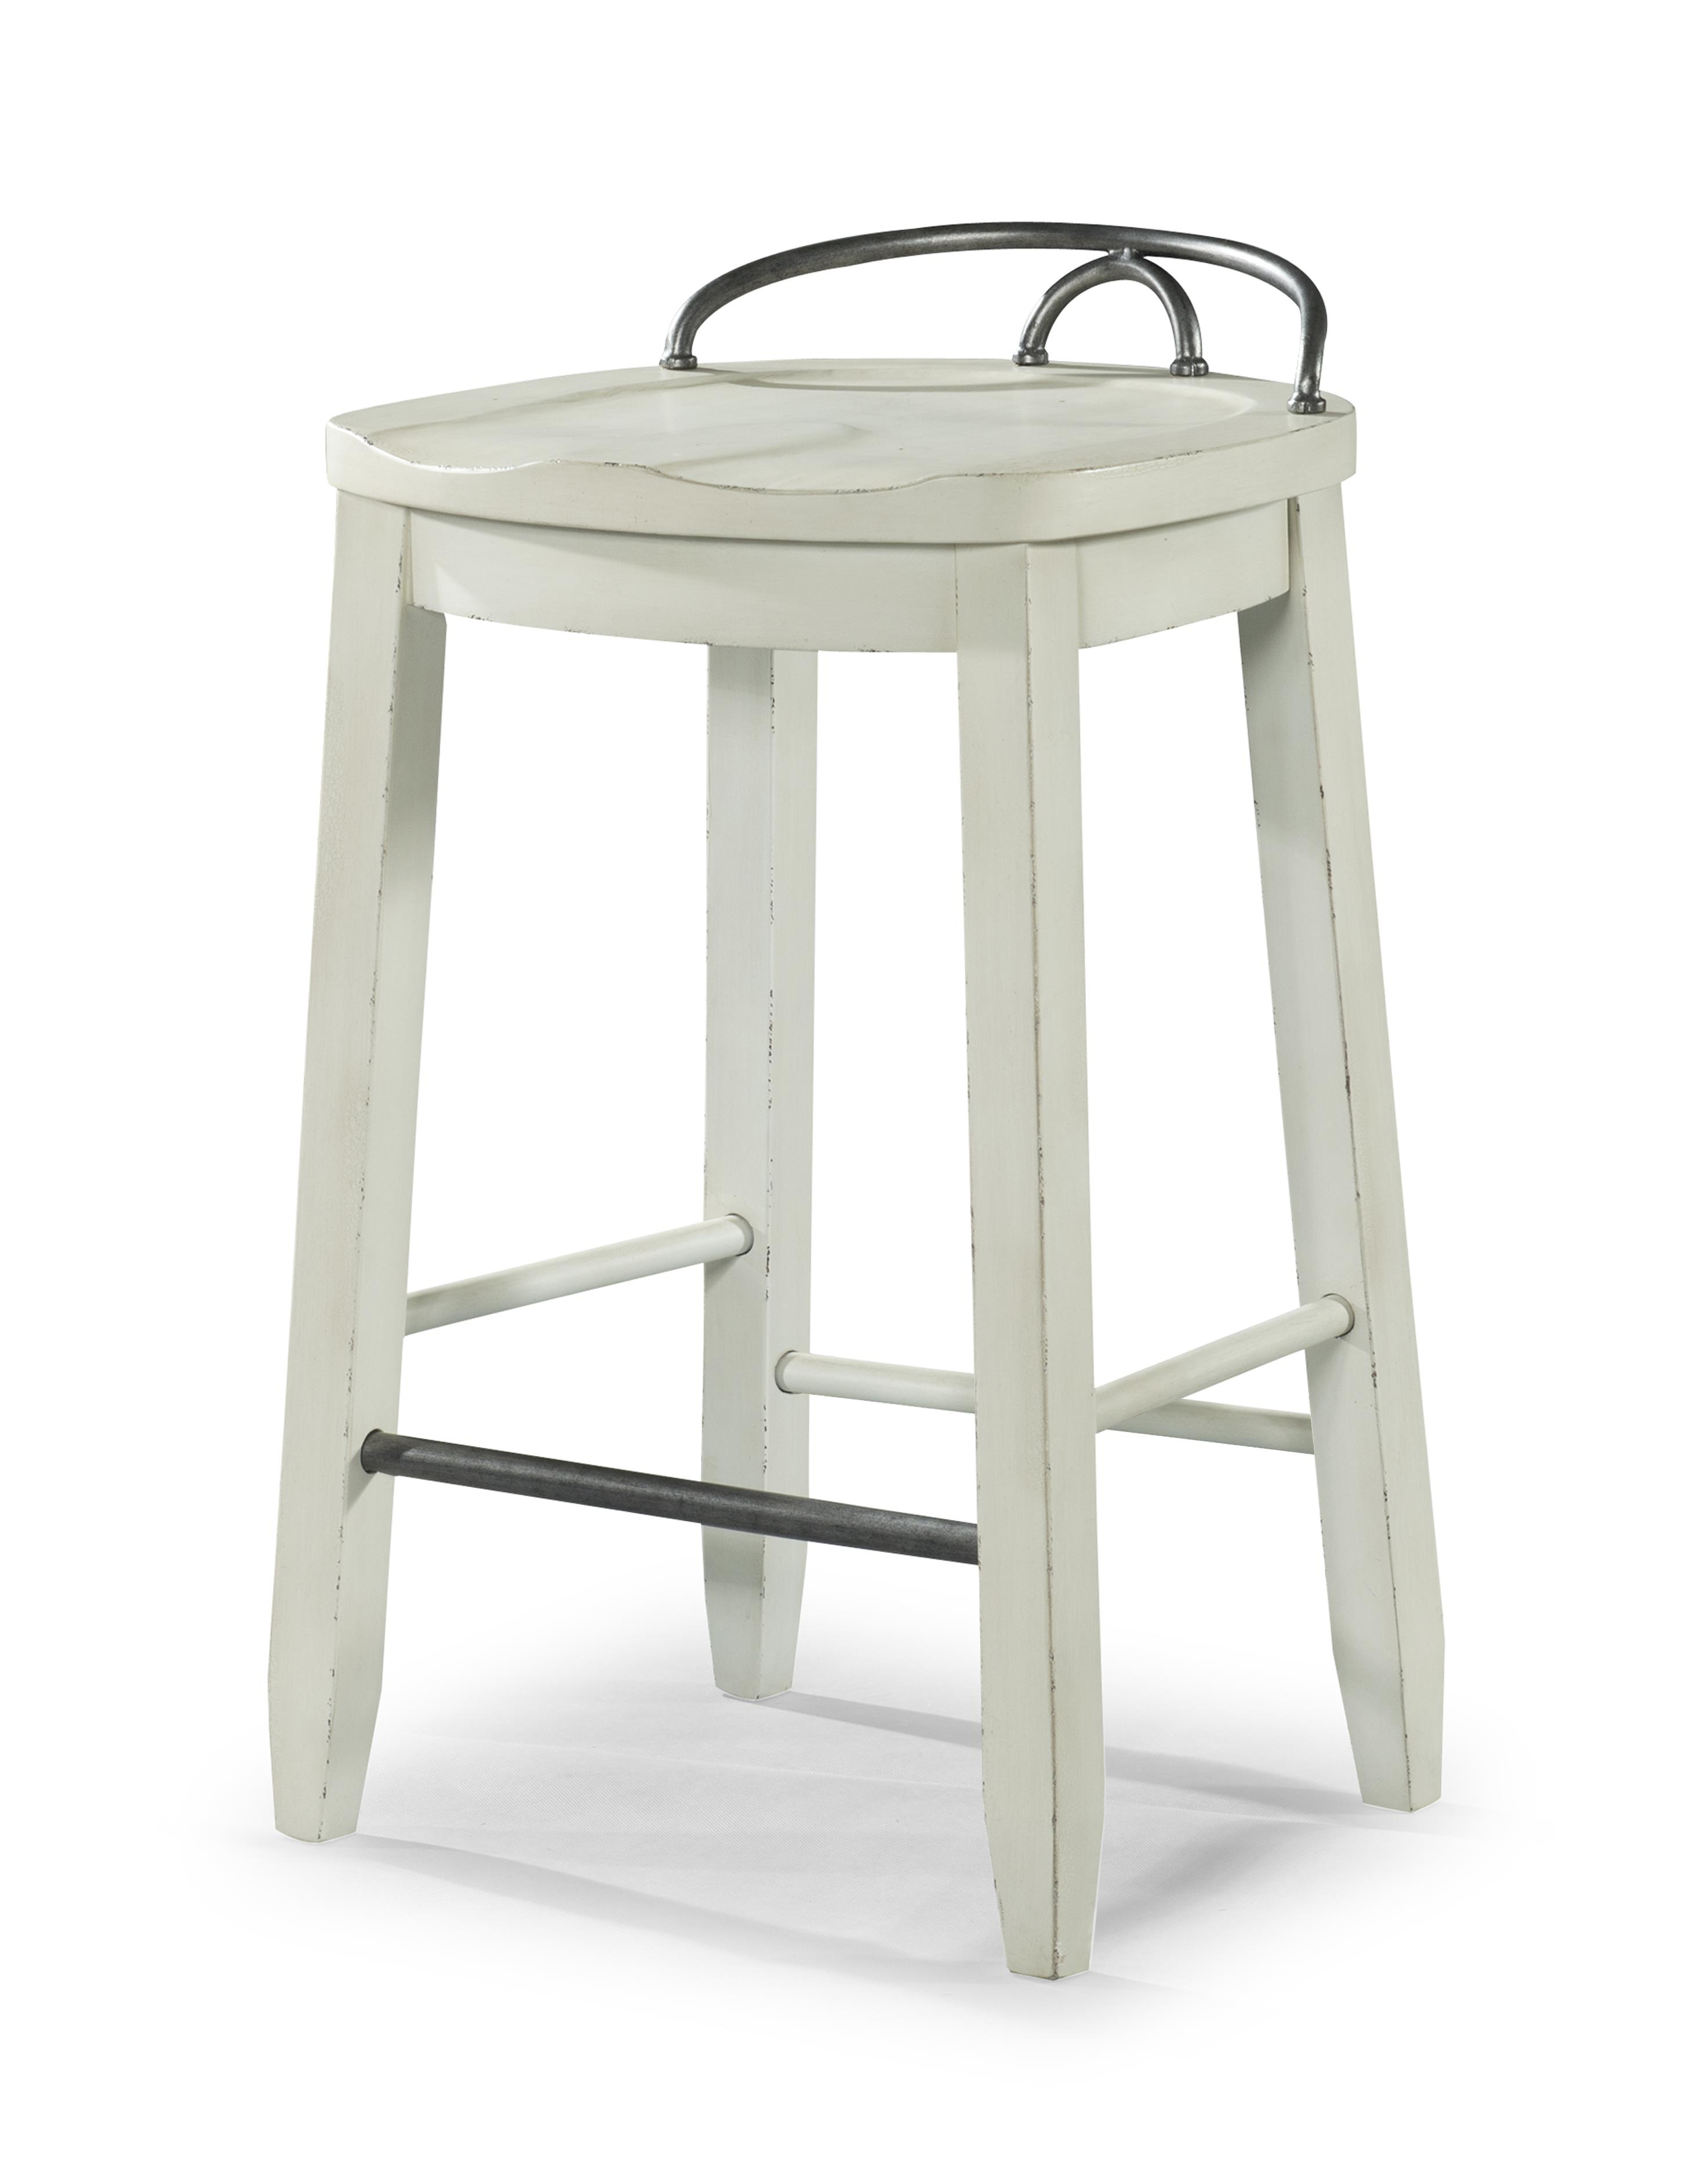 Trisha Yearwood Home Cowboy Saddle Stool by Klaussner at HomeWorld Furniture